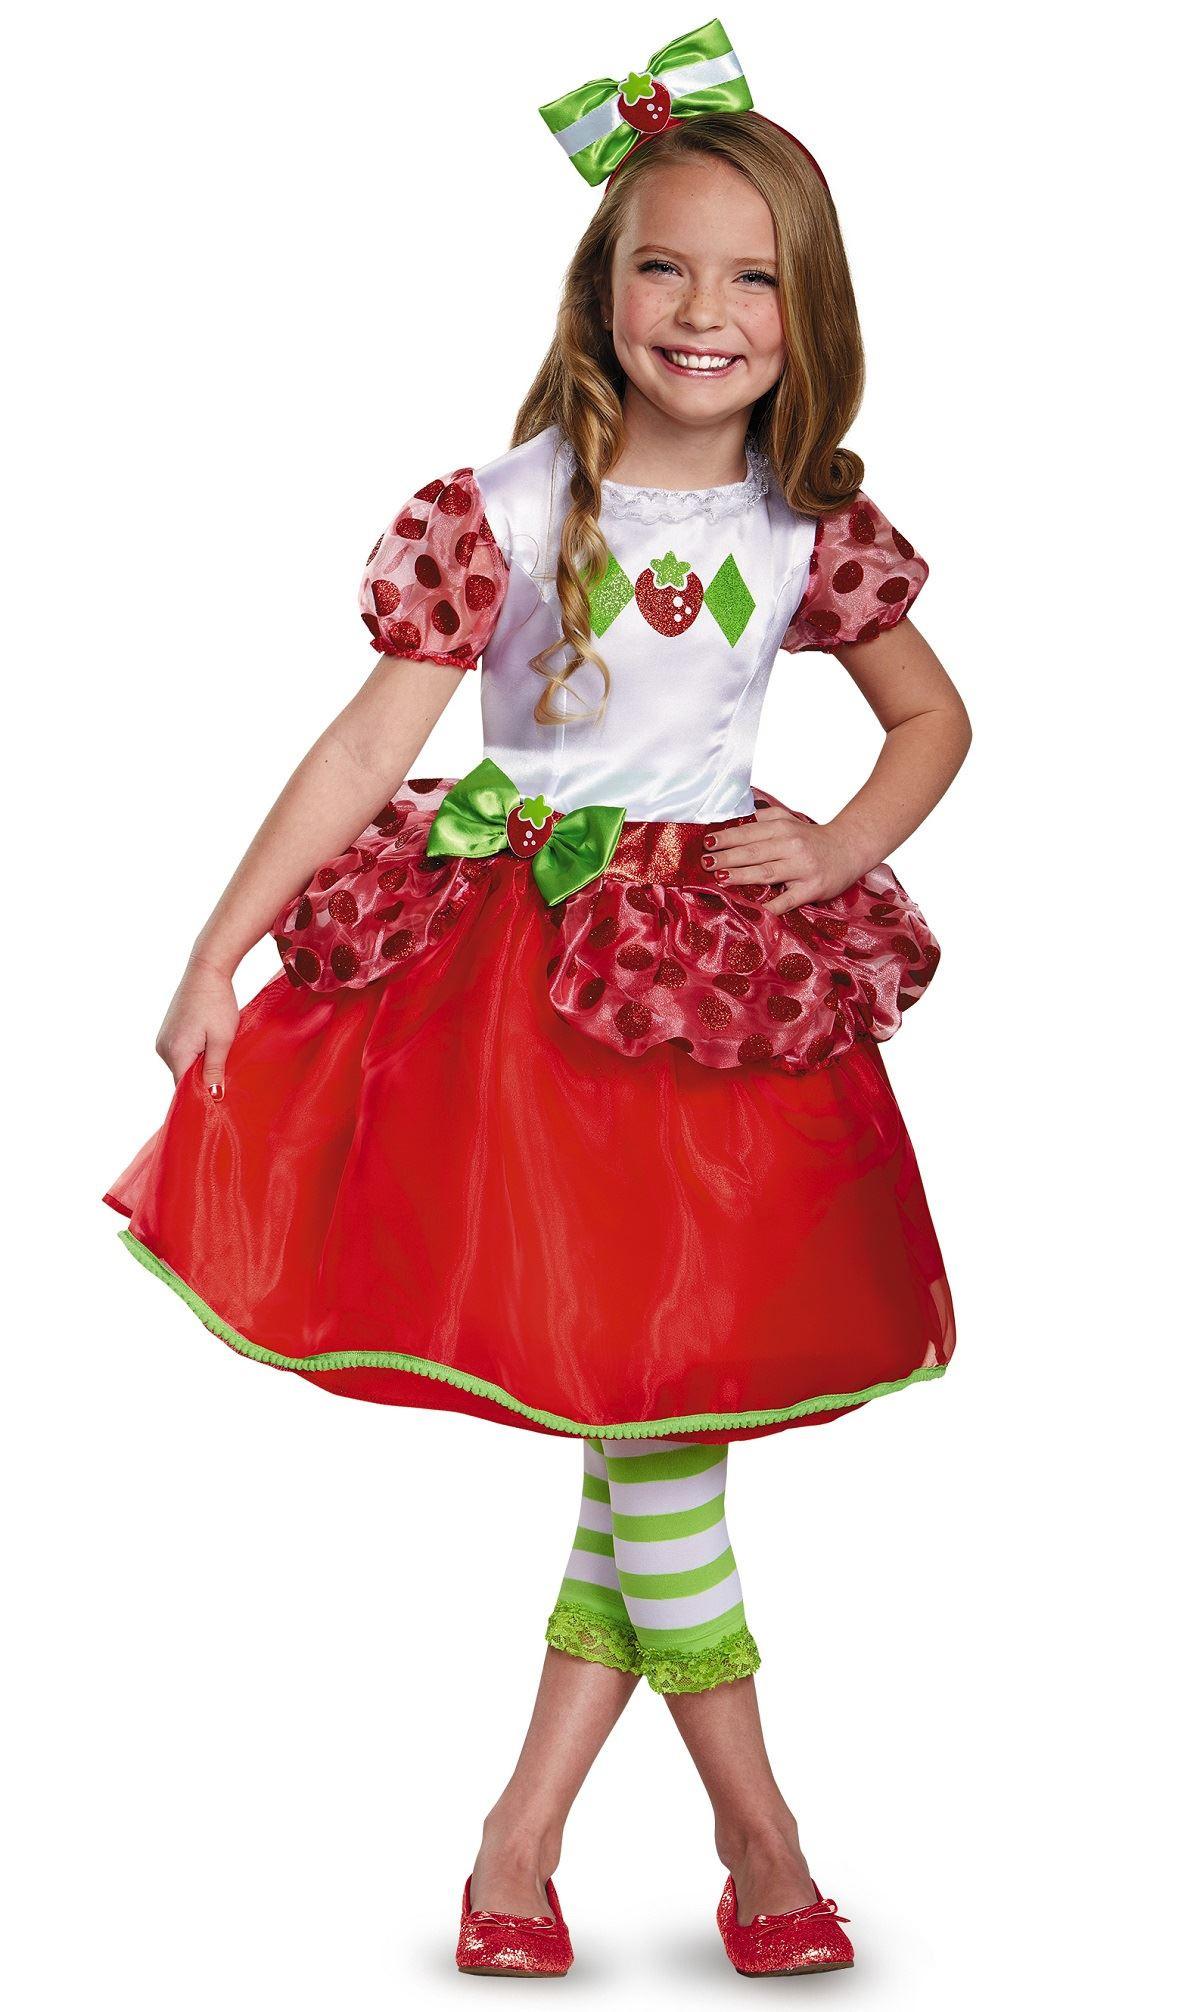 Strawberry Shortcake Haloween Costume  Kids Strawberry Shortcake Girls Costume $37 99